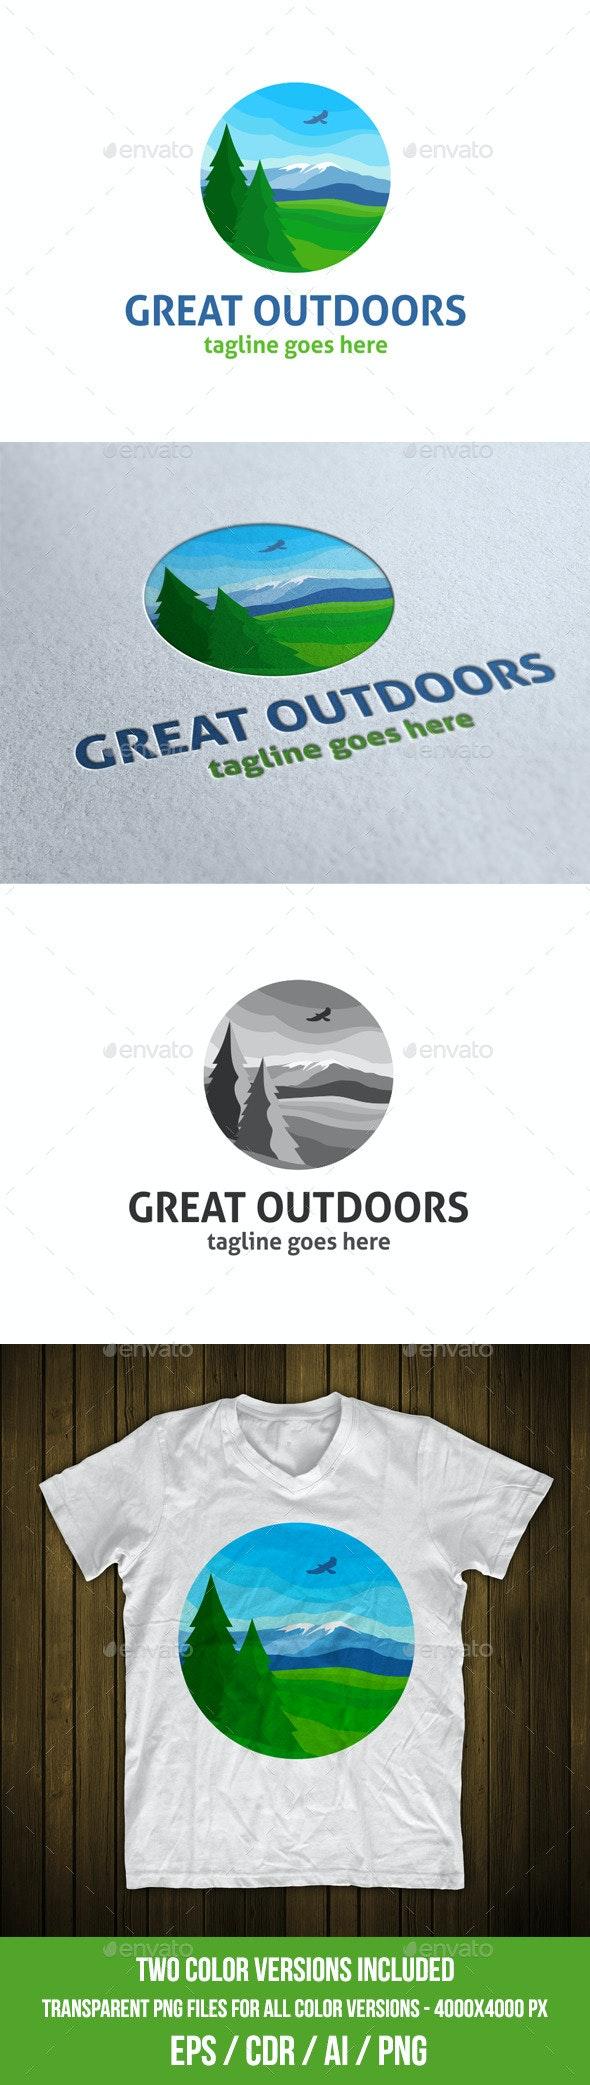 Great Outdoors Logo Template - Nature Logo Templates